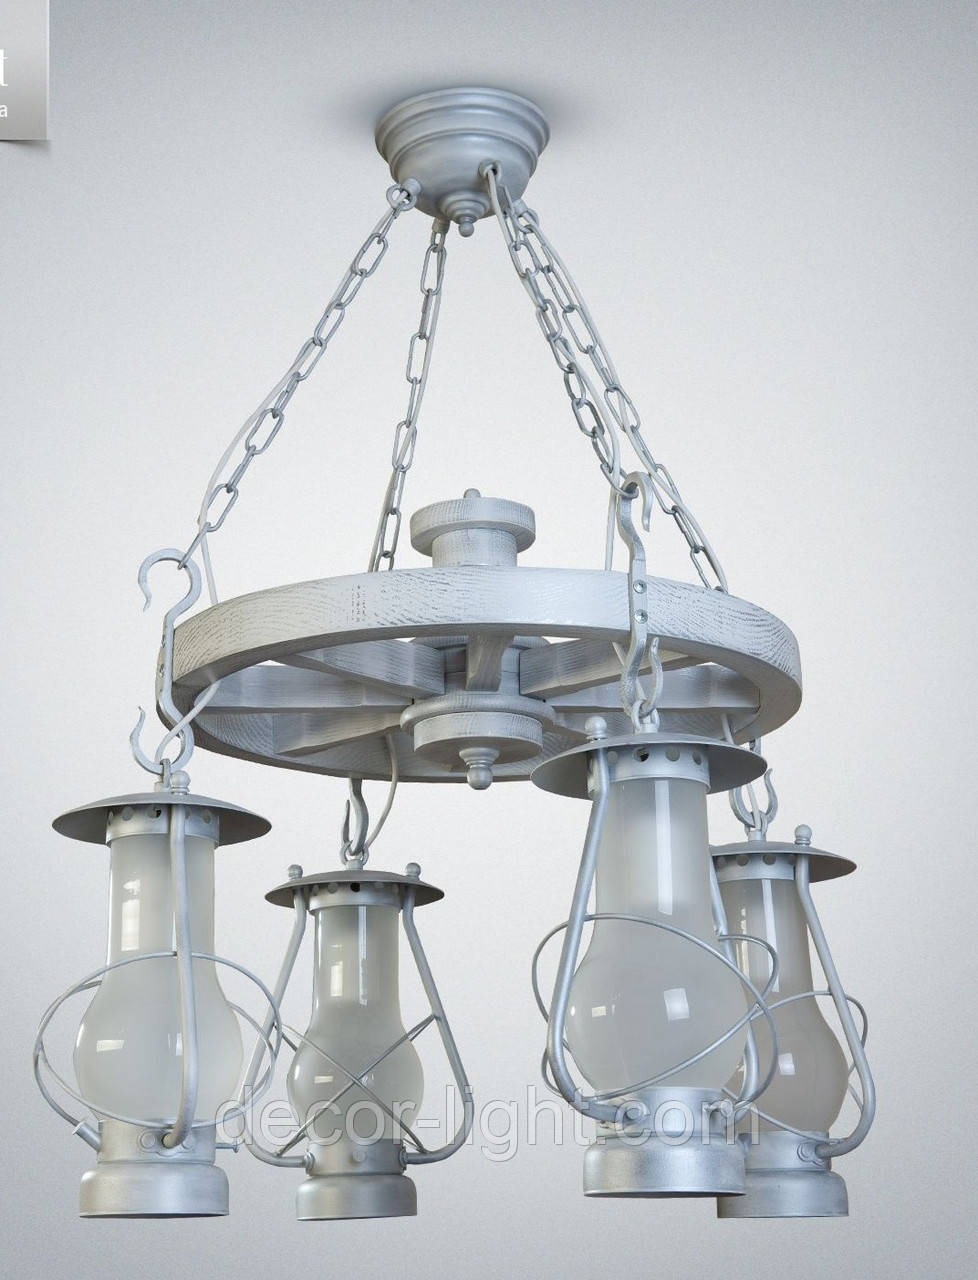 Люстра 4-х ламповая, люстра керосинка, люстра колесо 9404-1